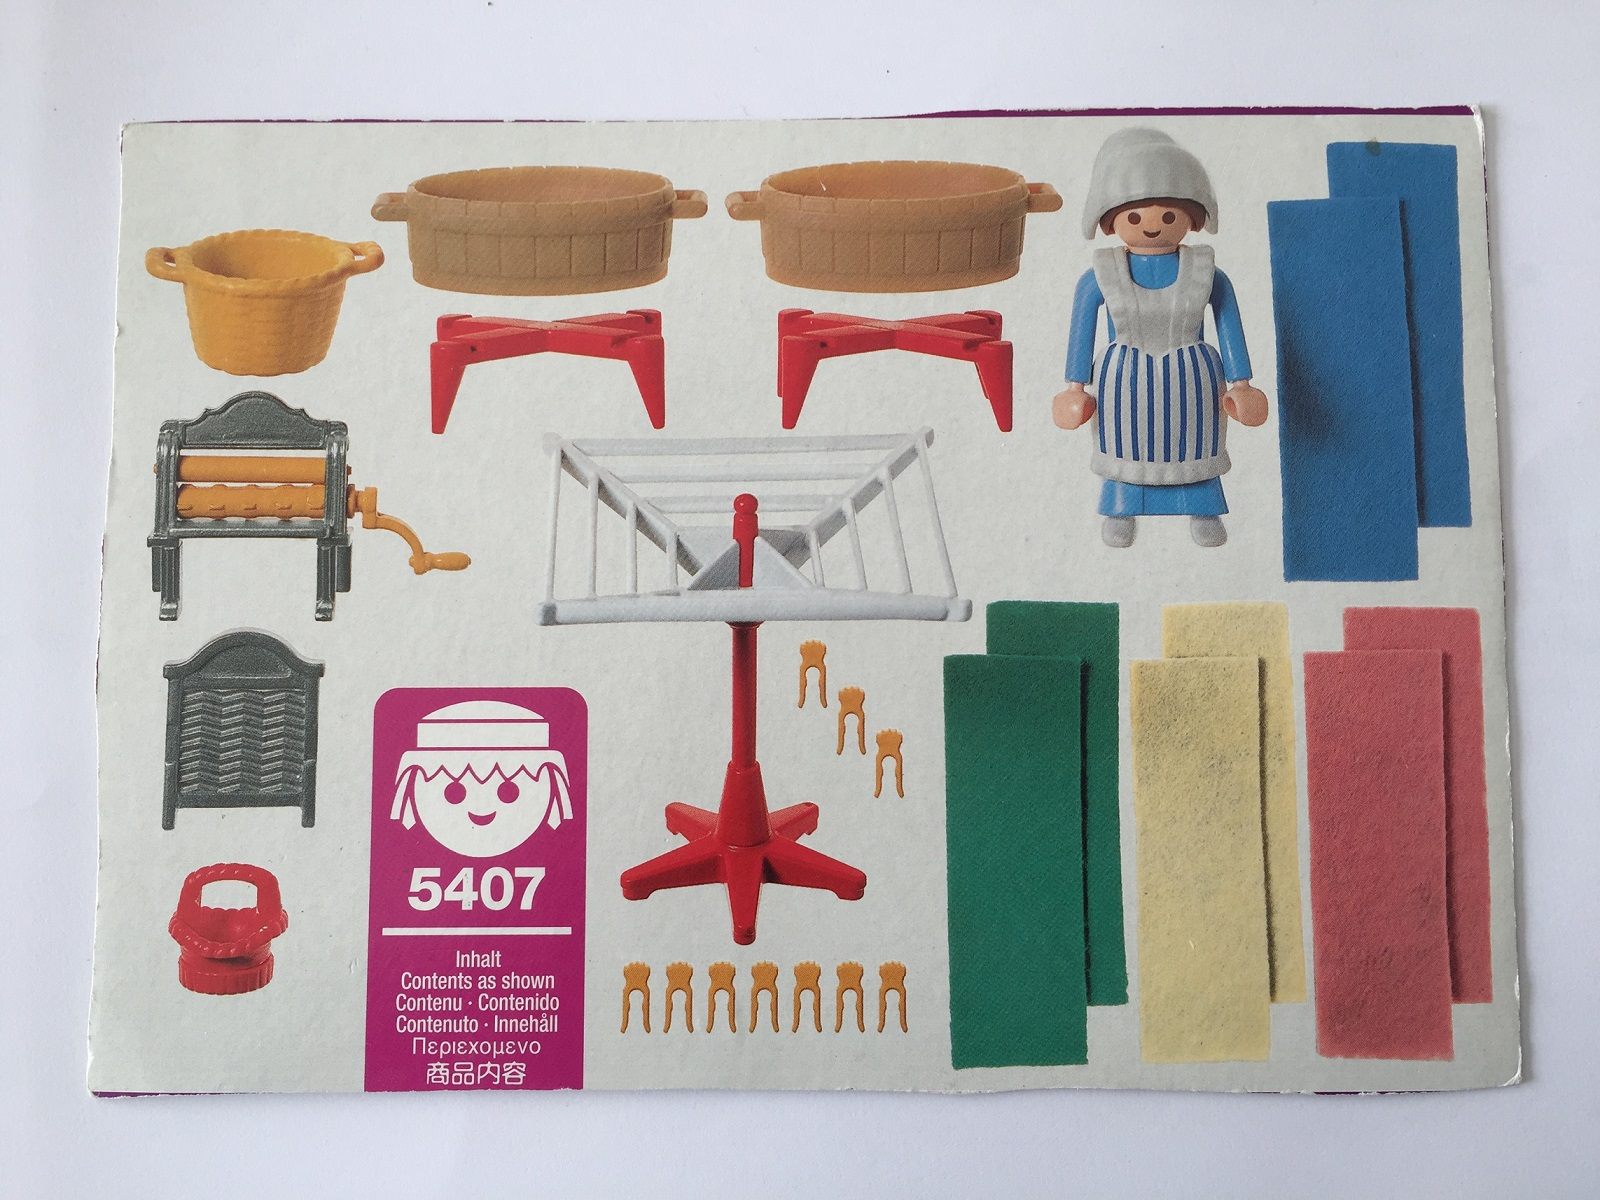 boite playmobil 5407 victorian lingere maison 1900